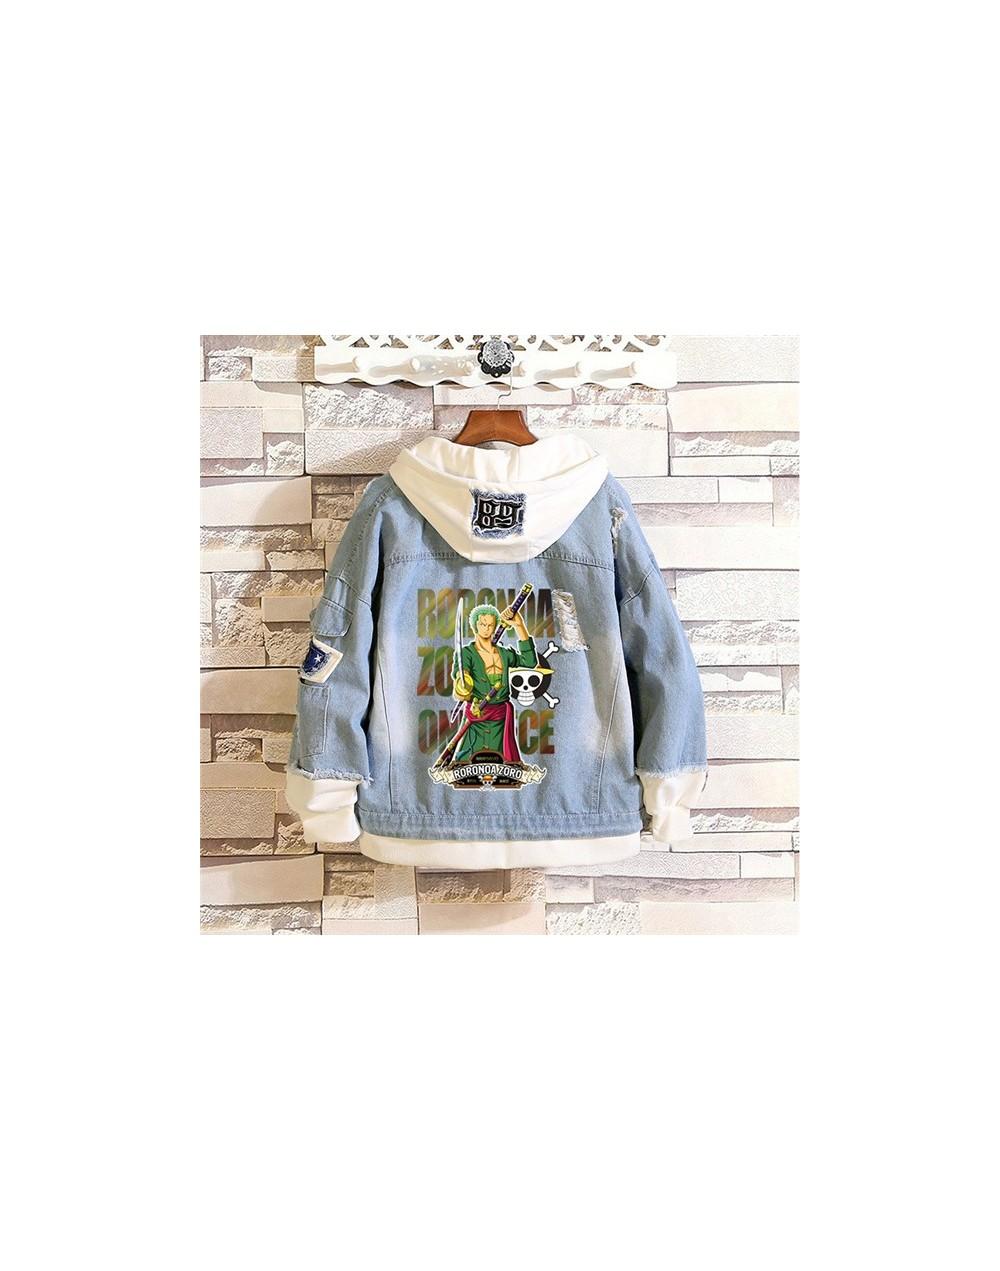 ONE PIECE Luffy Zoro Cosplay Jeans Denim Jacket Long Sweatshirt Harajuku Streetwear Hoodies Fashion Hooded Coats Windbreaker...